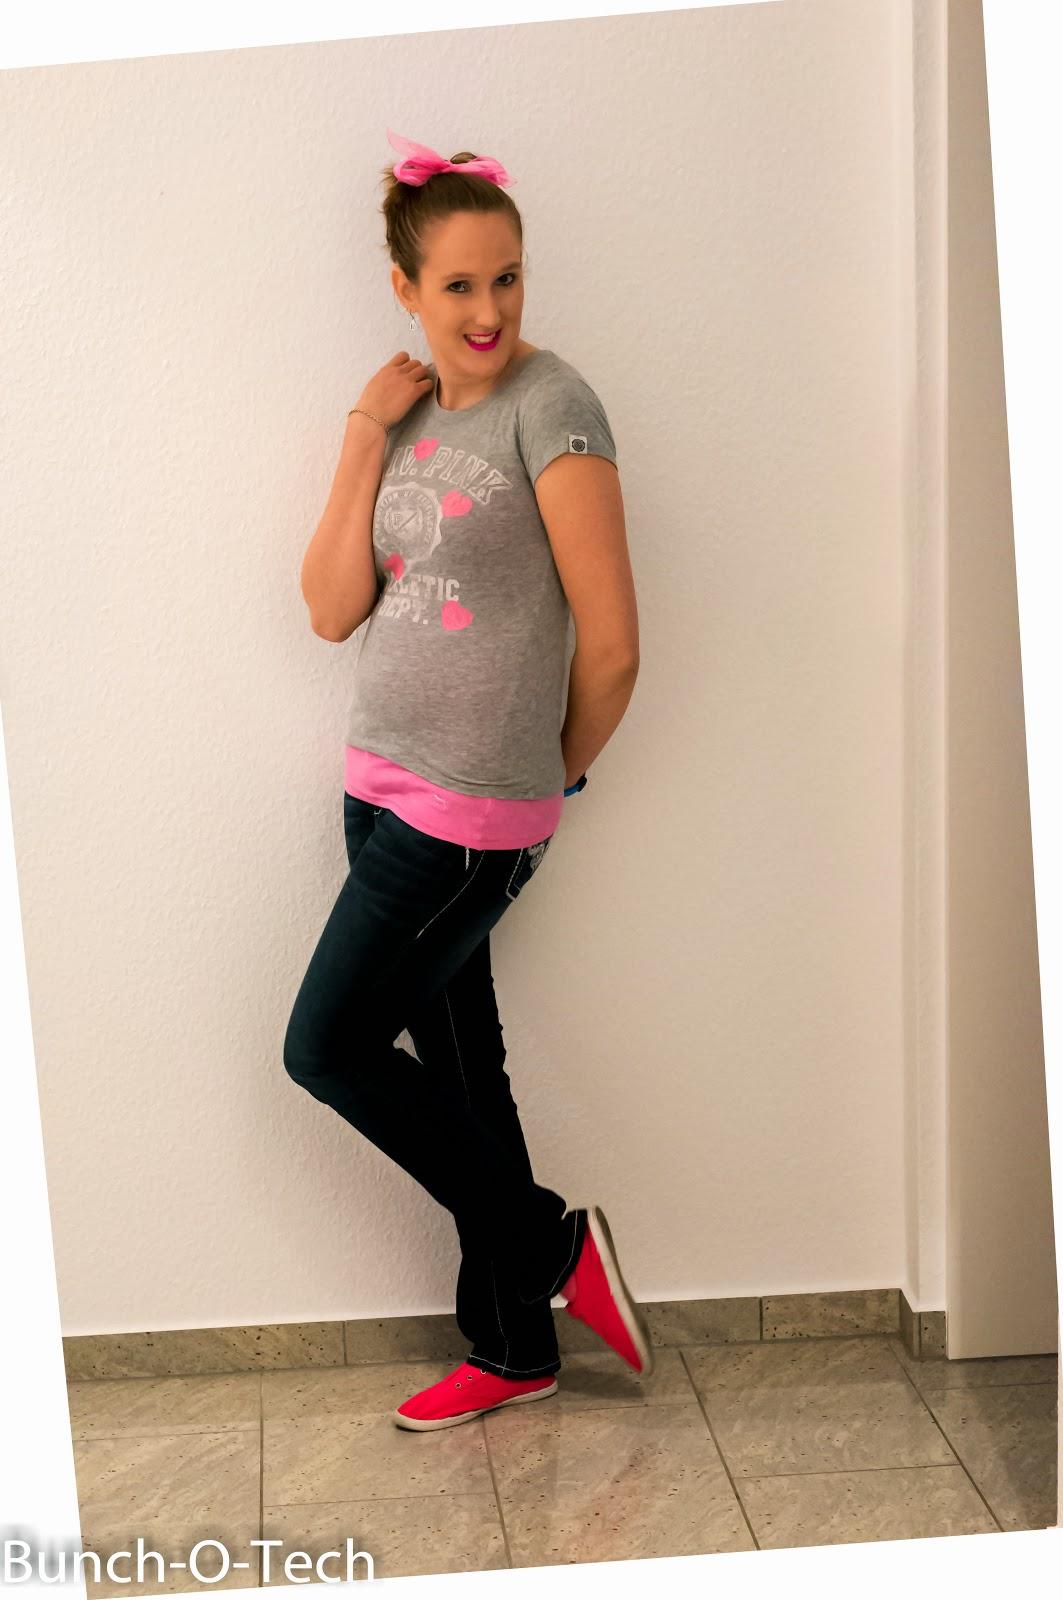 Amy-4-October%2B20%2C%2B2014.jpg